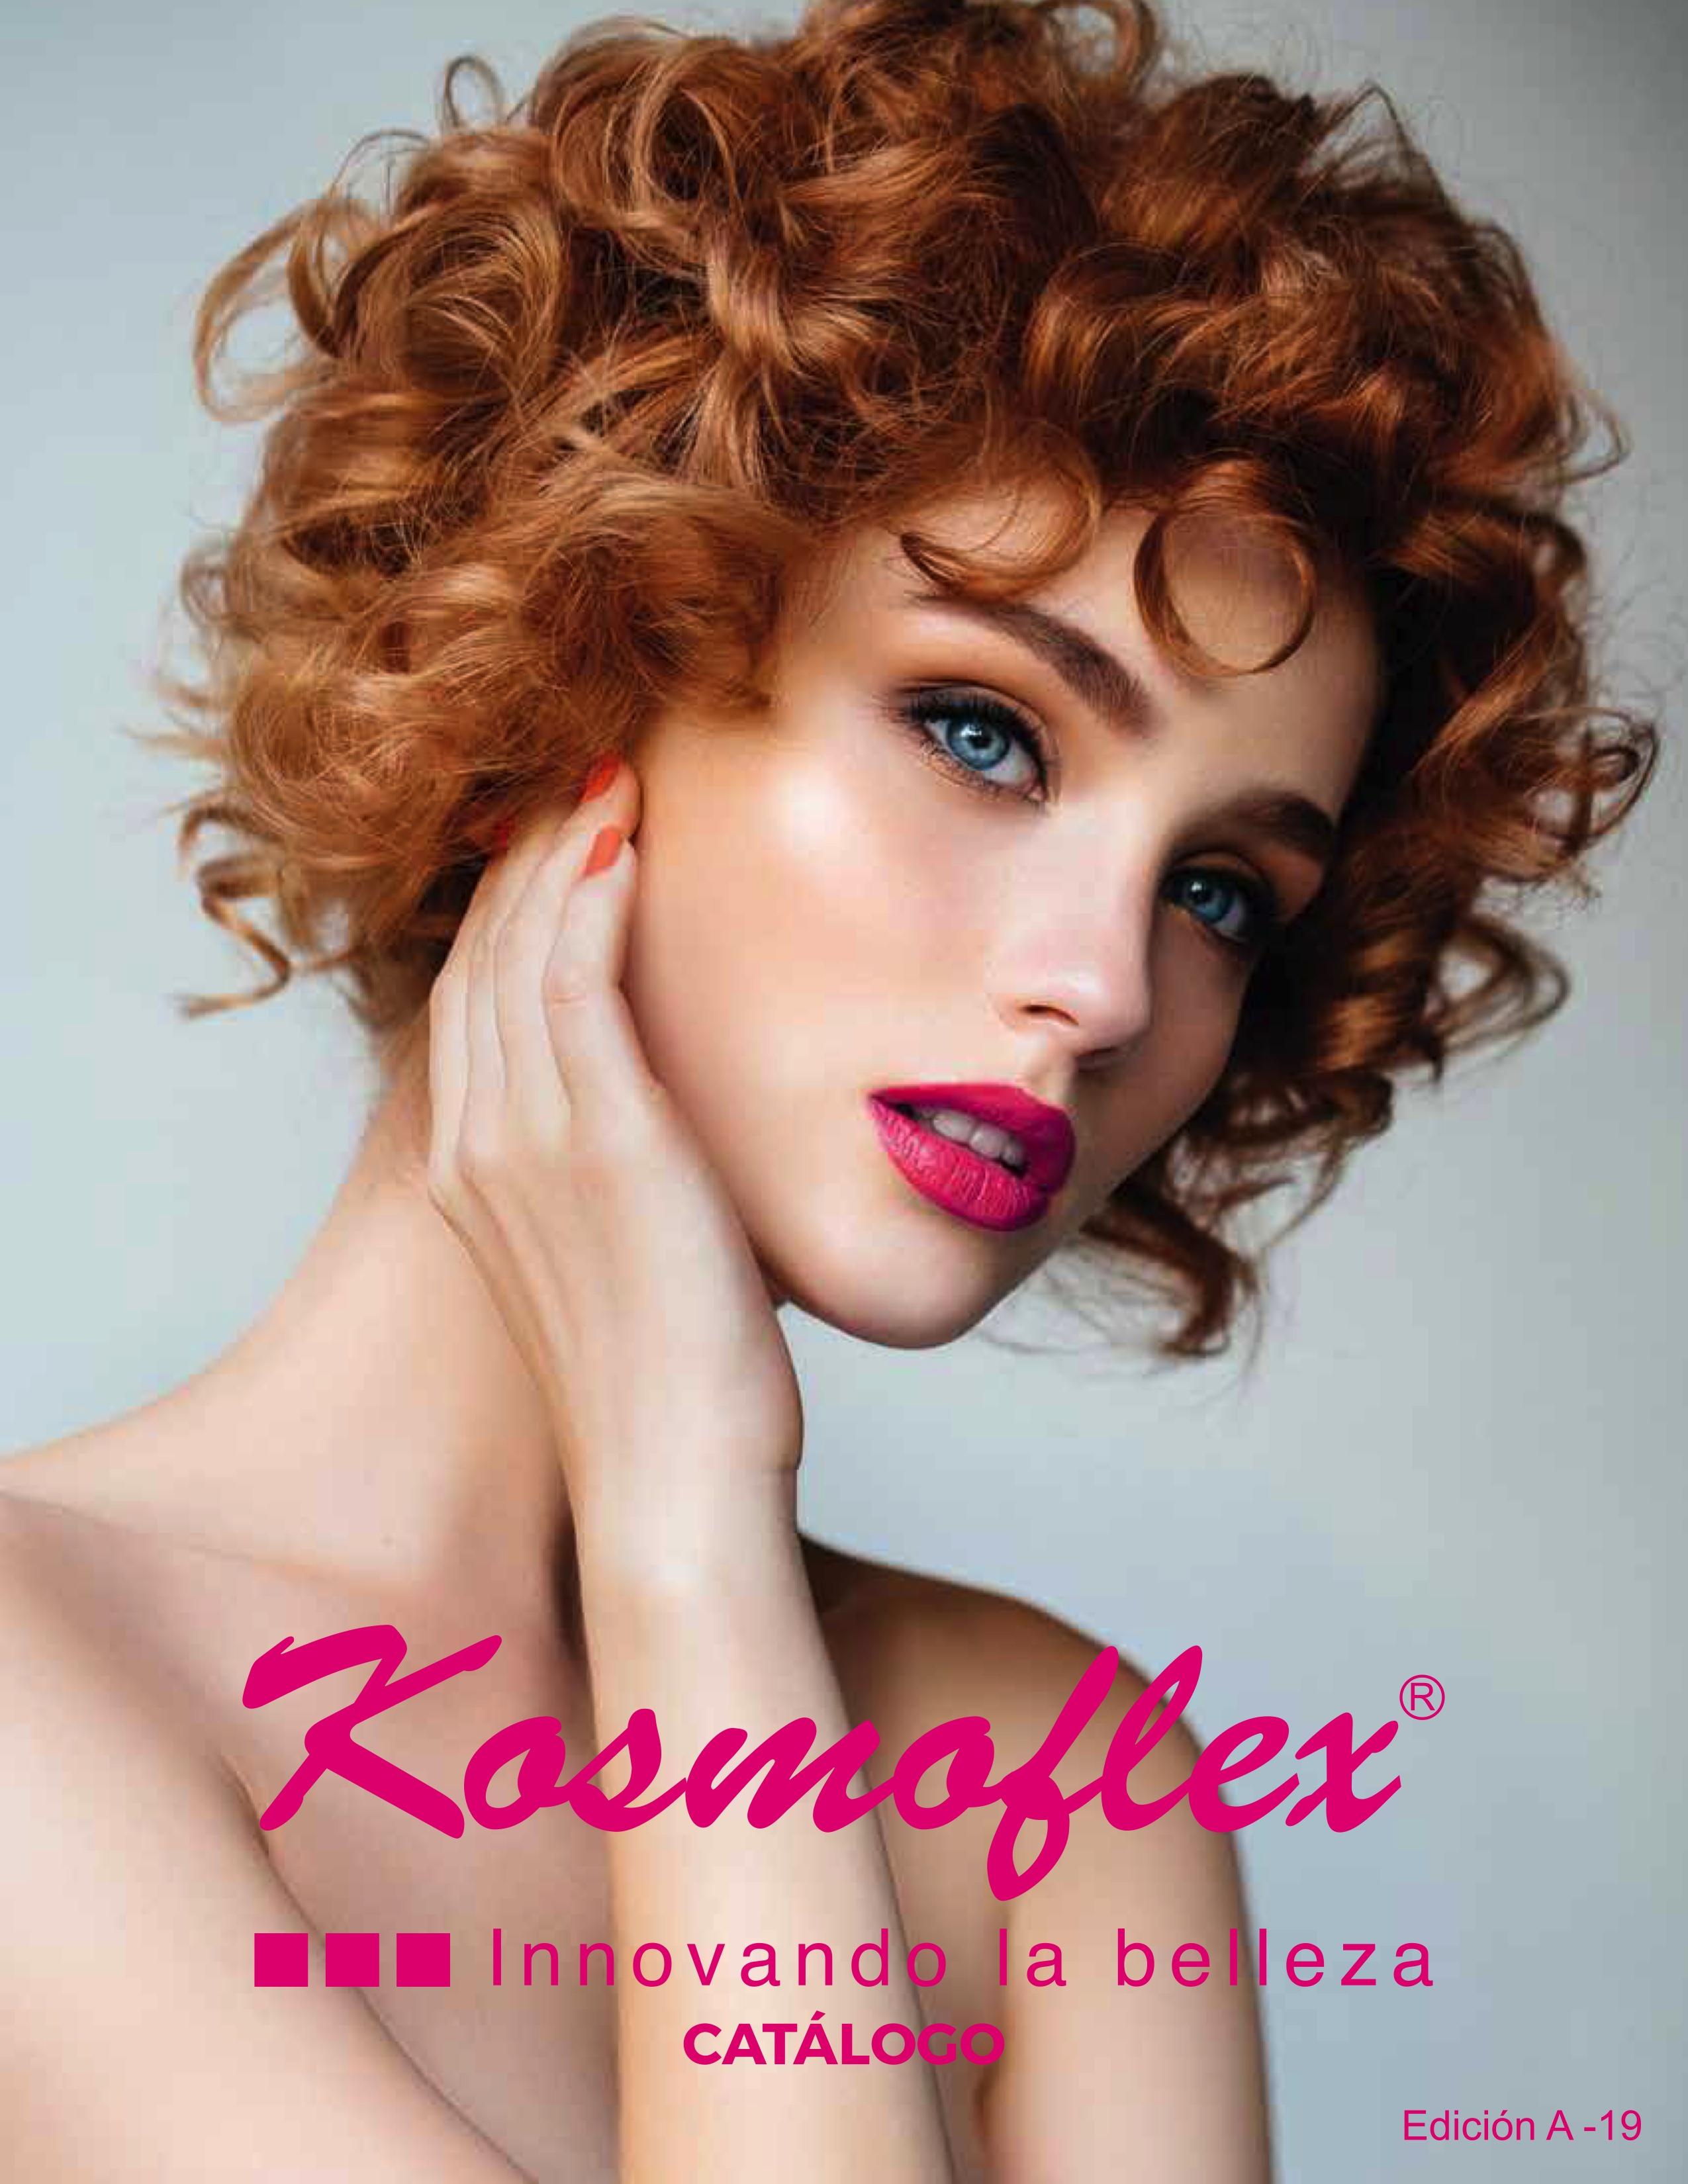 Catalogo Kosmoflex